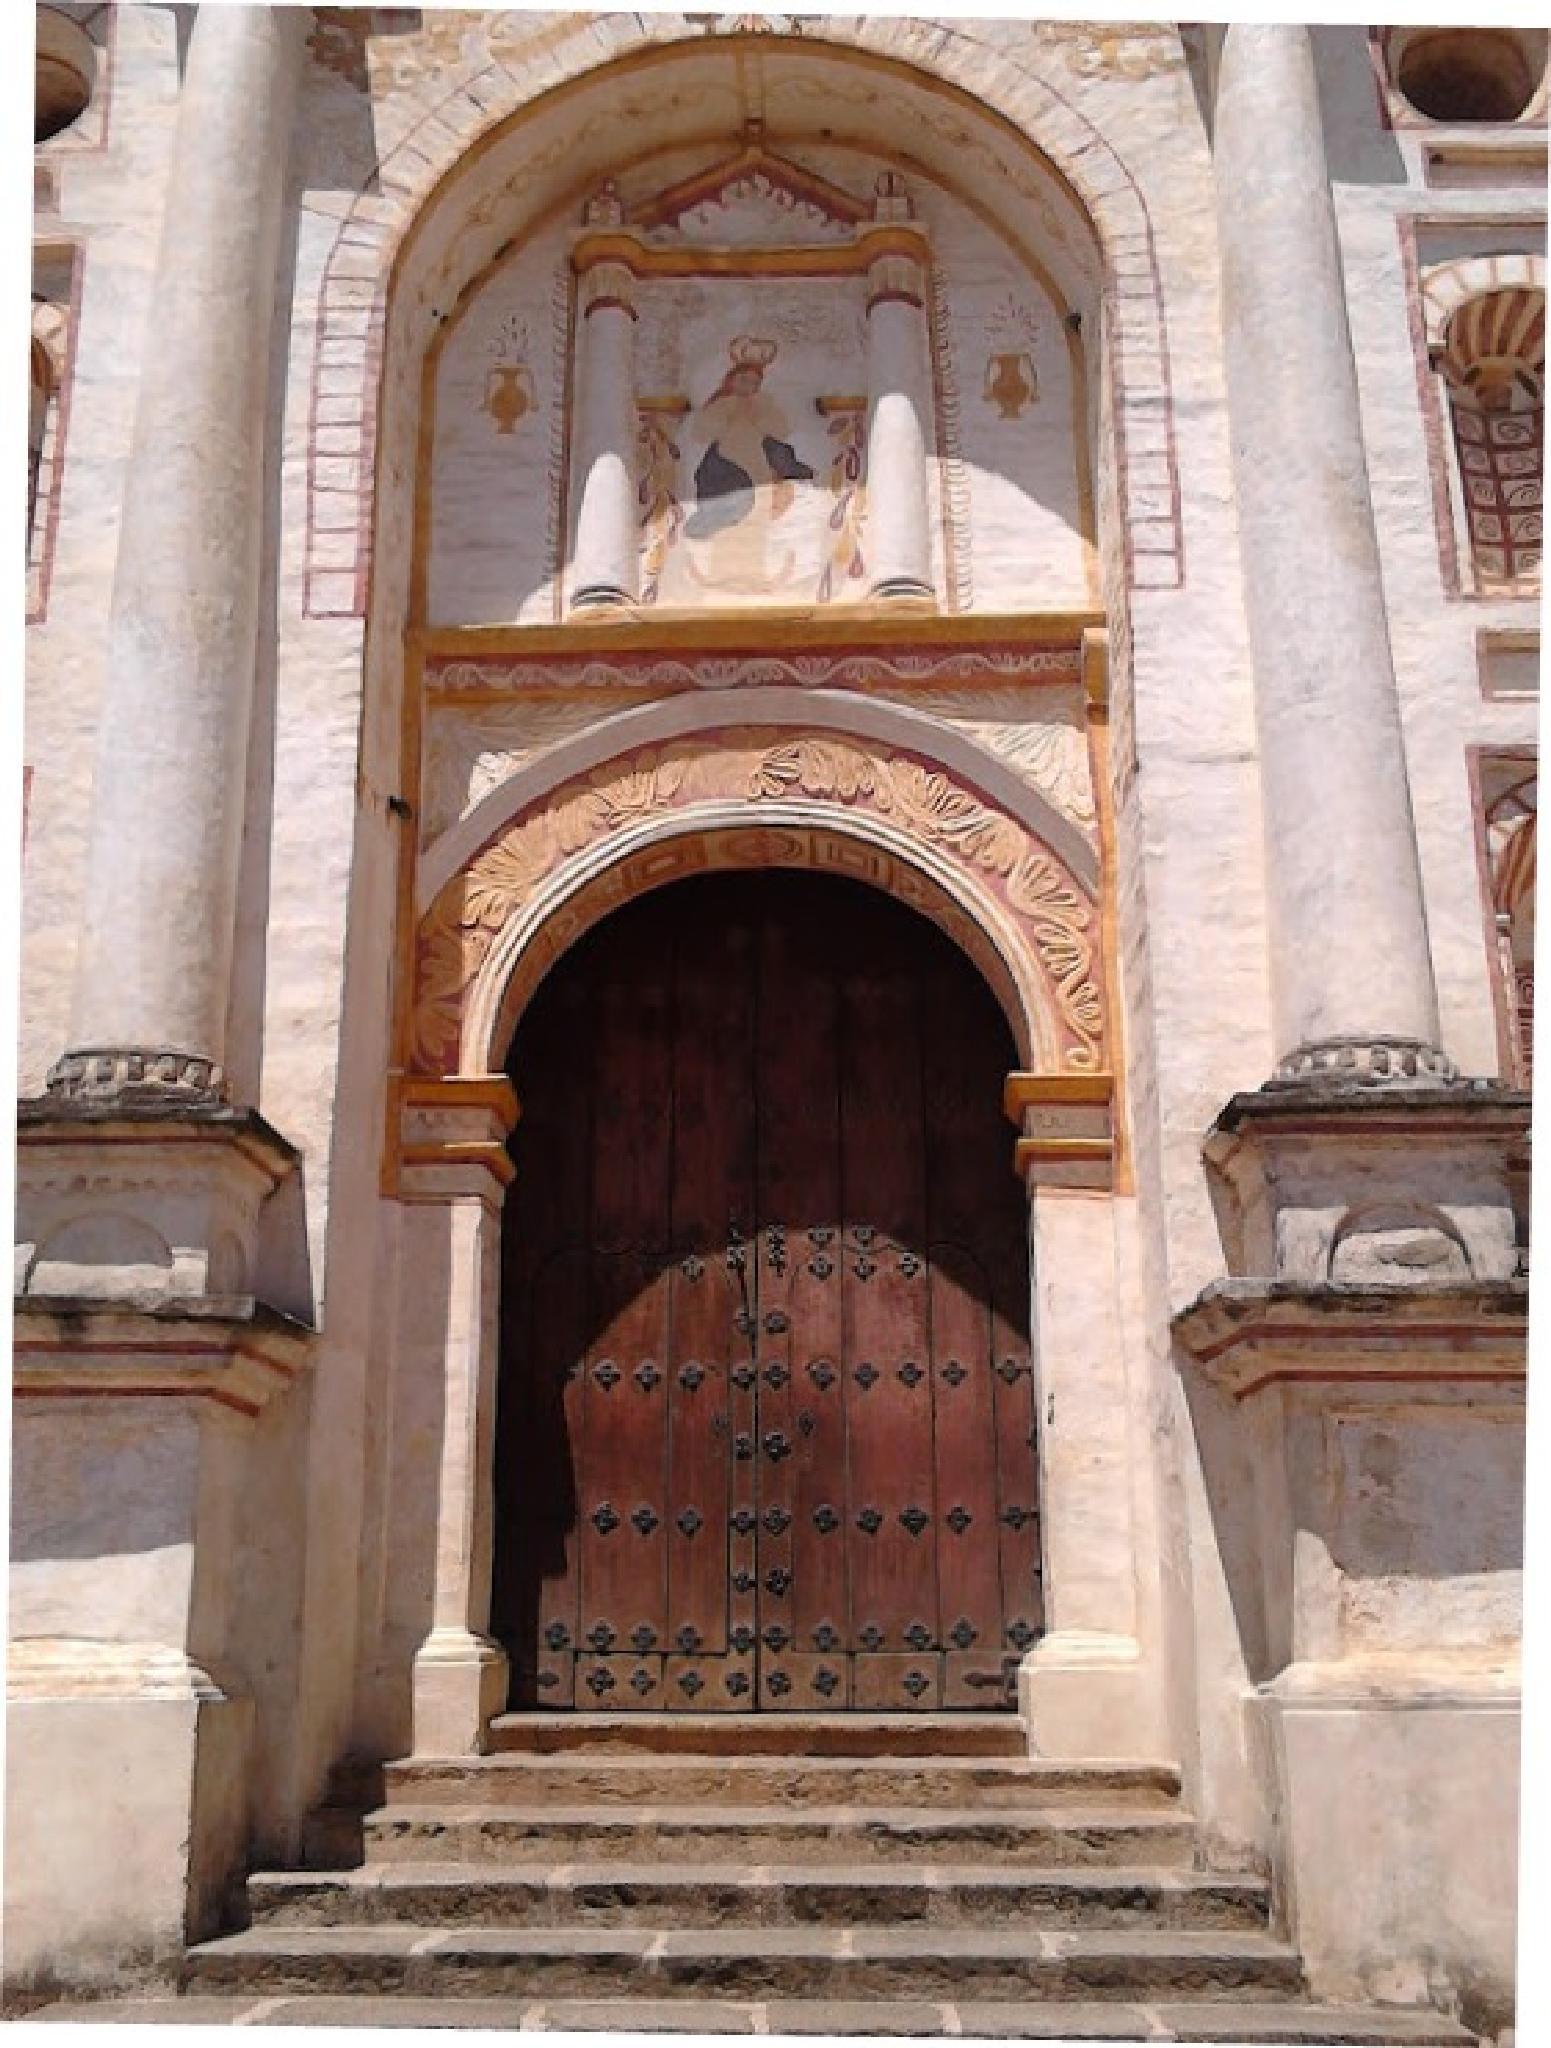 Entrance by Tirsa Jean Mazariegos